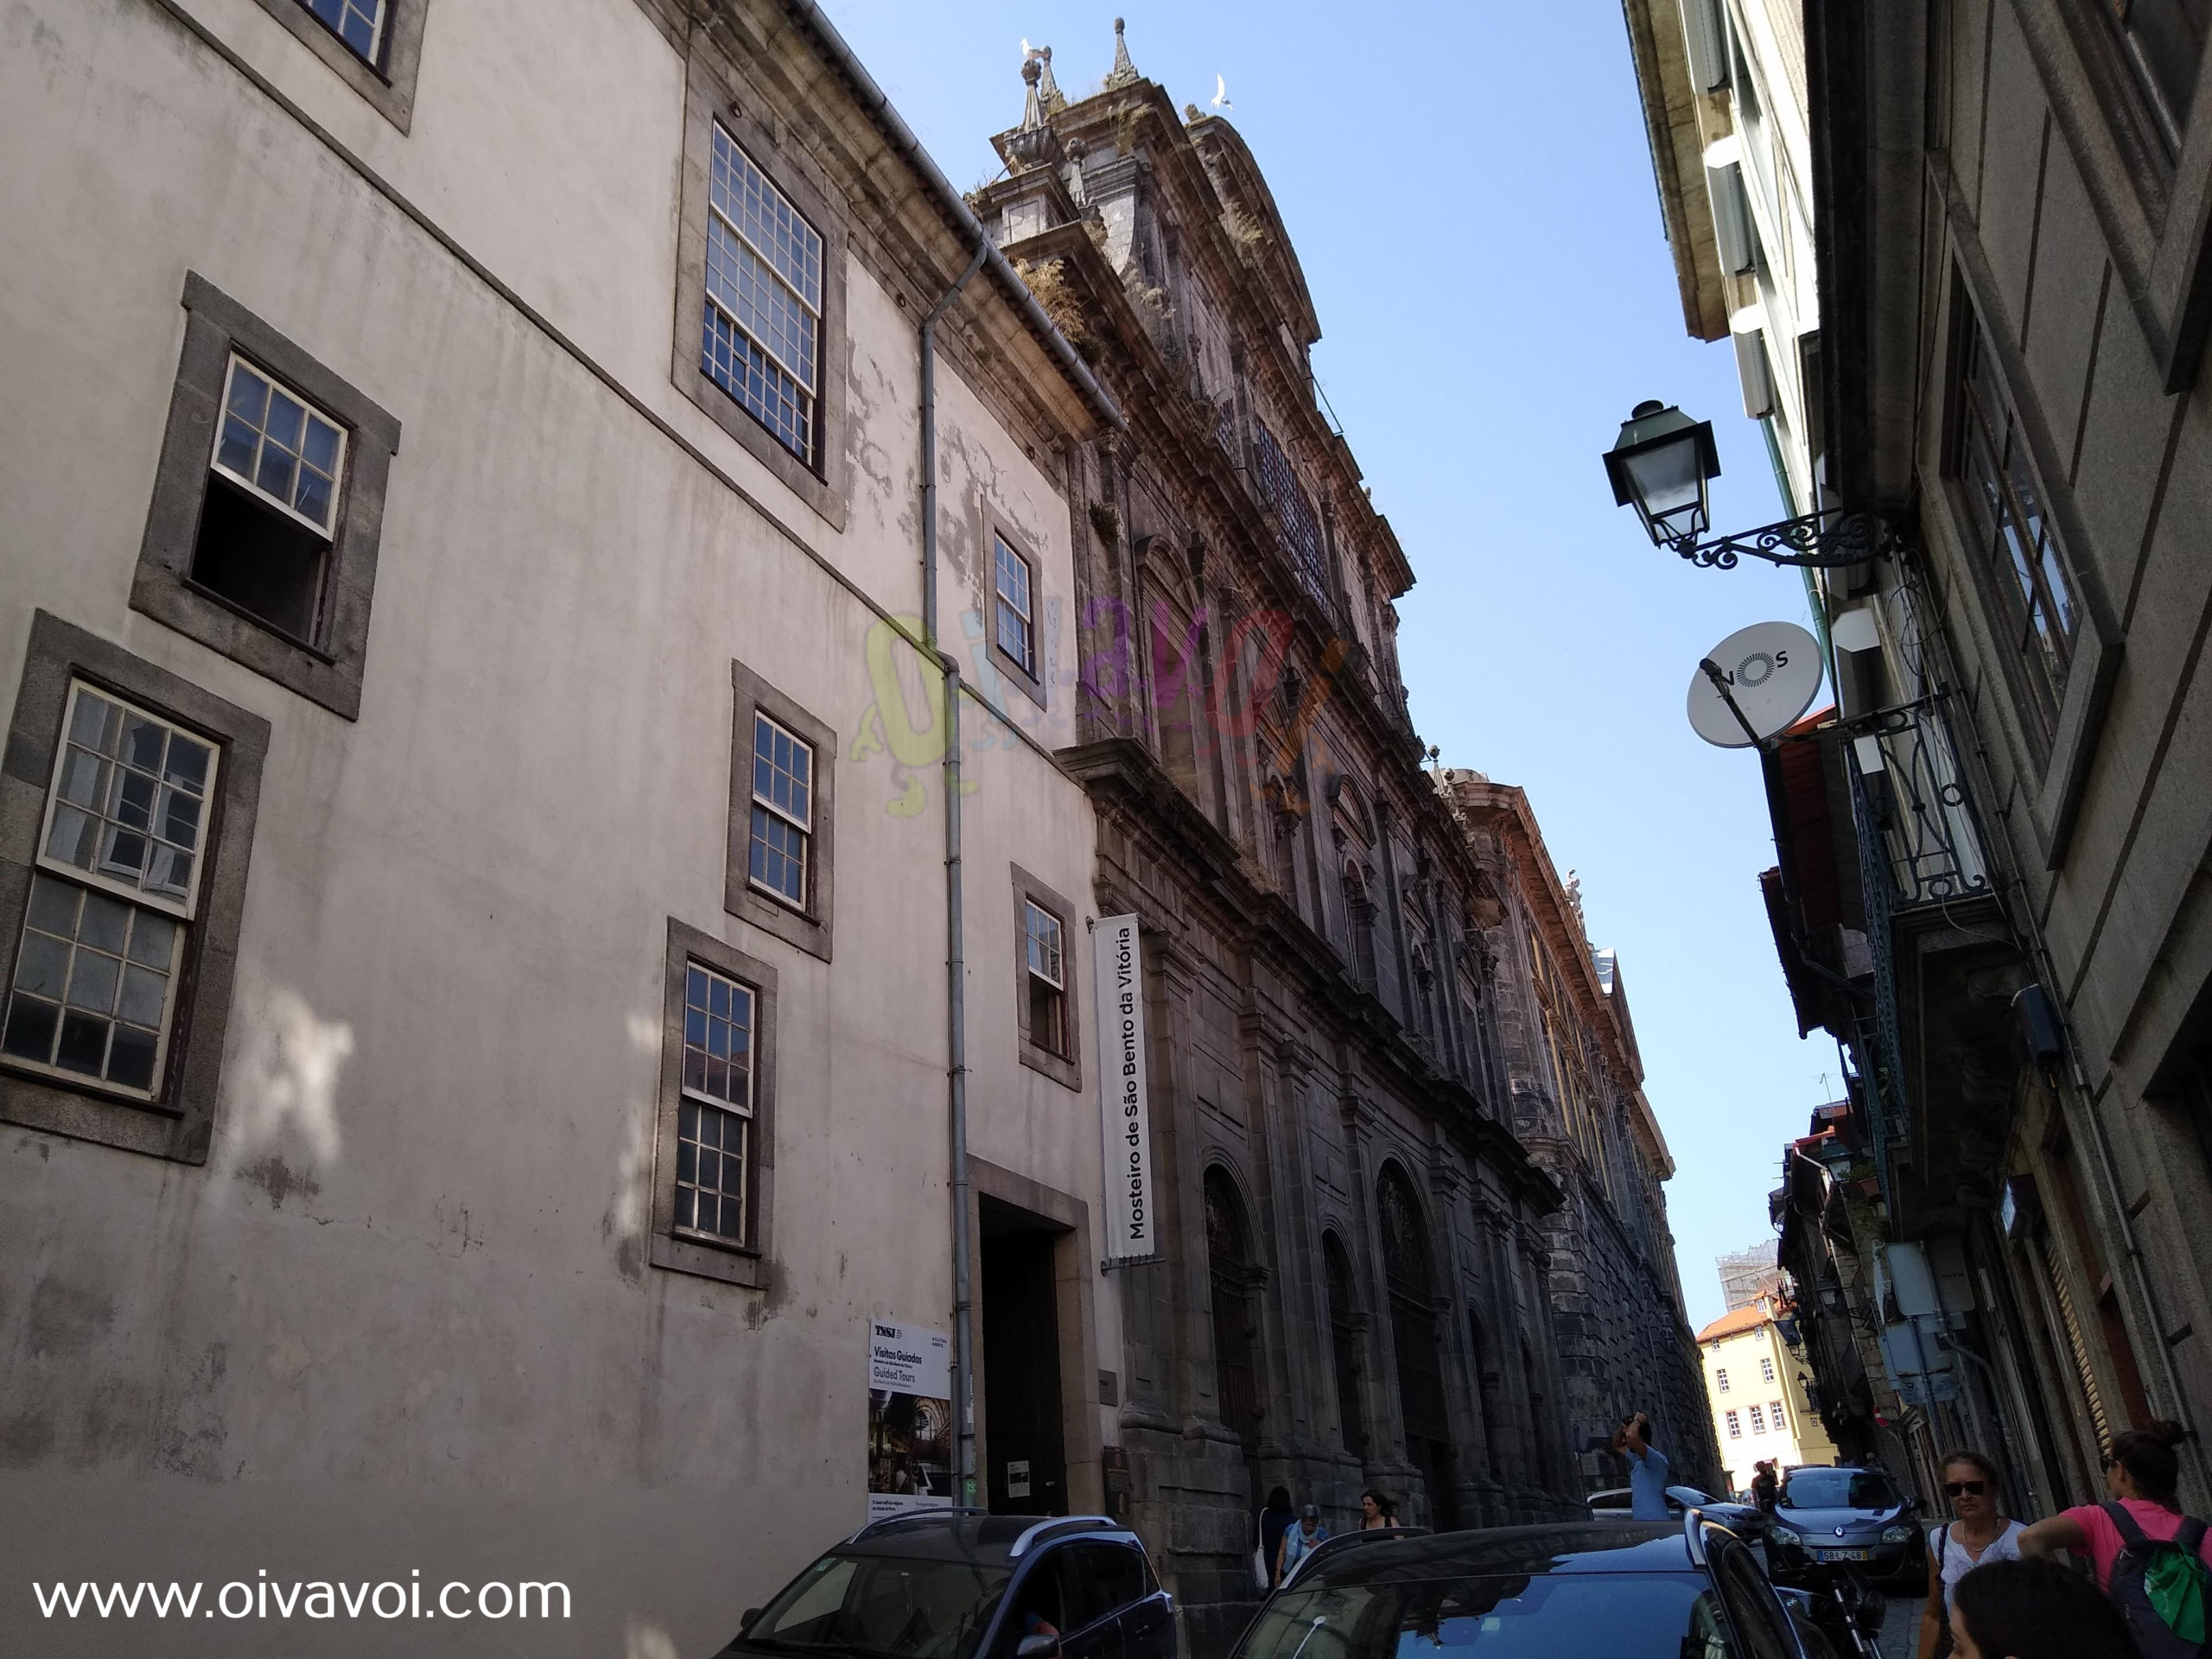 Monasterio de Sao Bento de Oporto